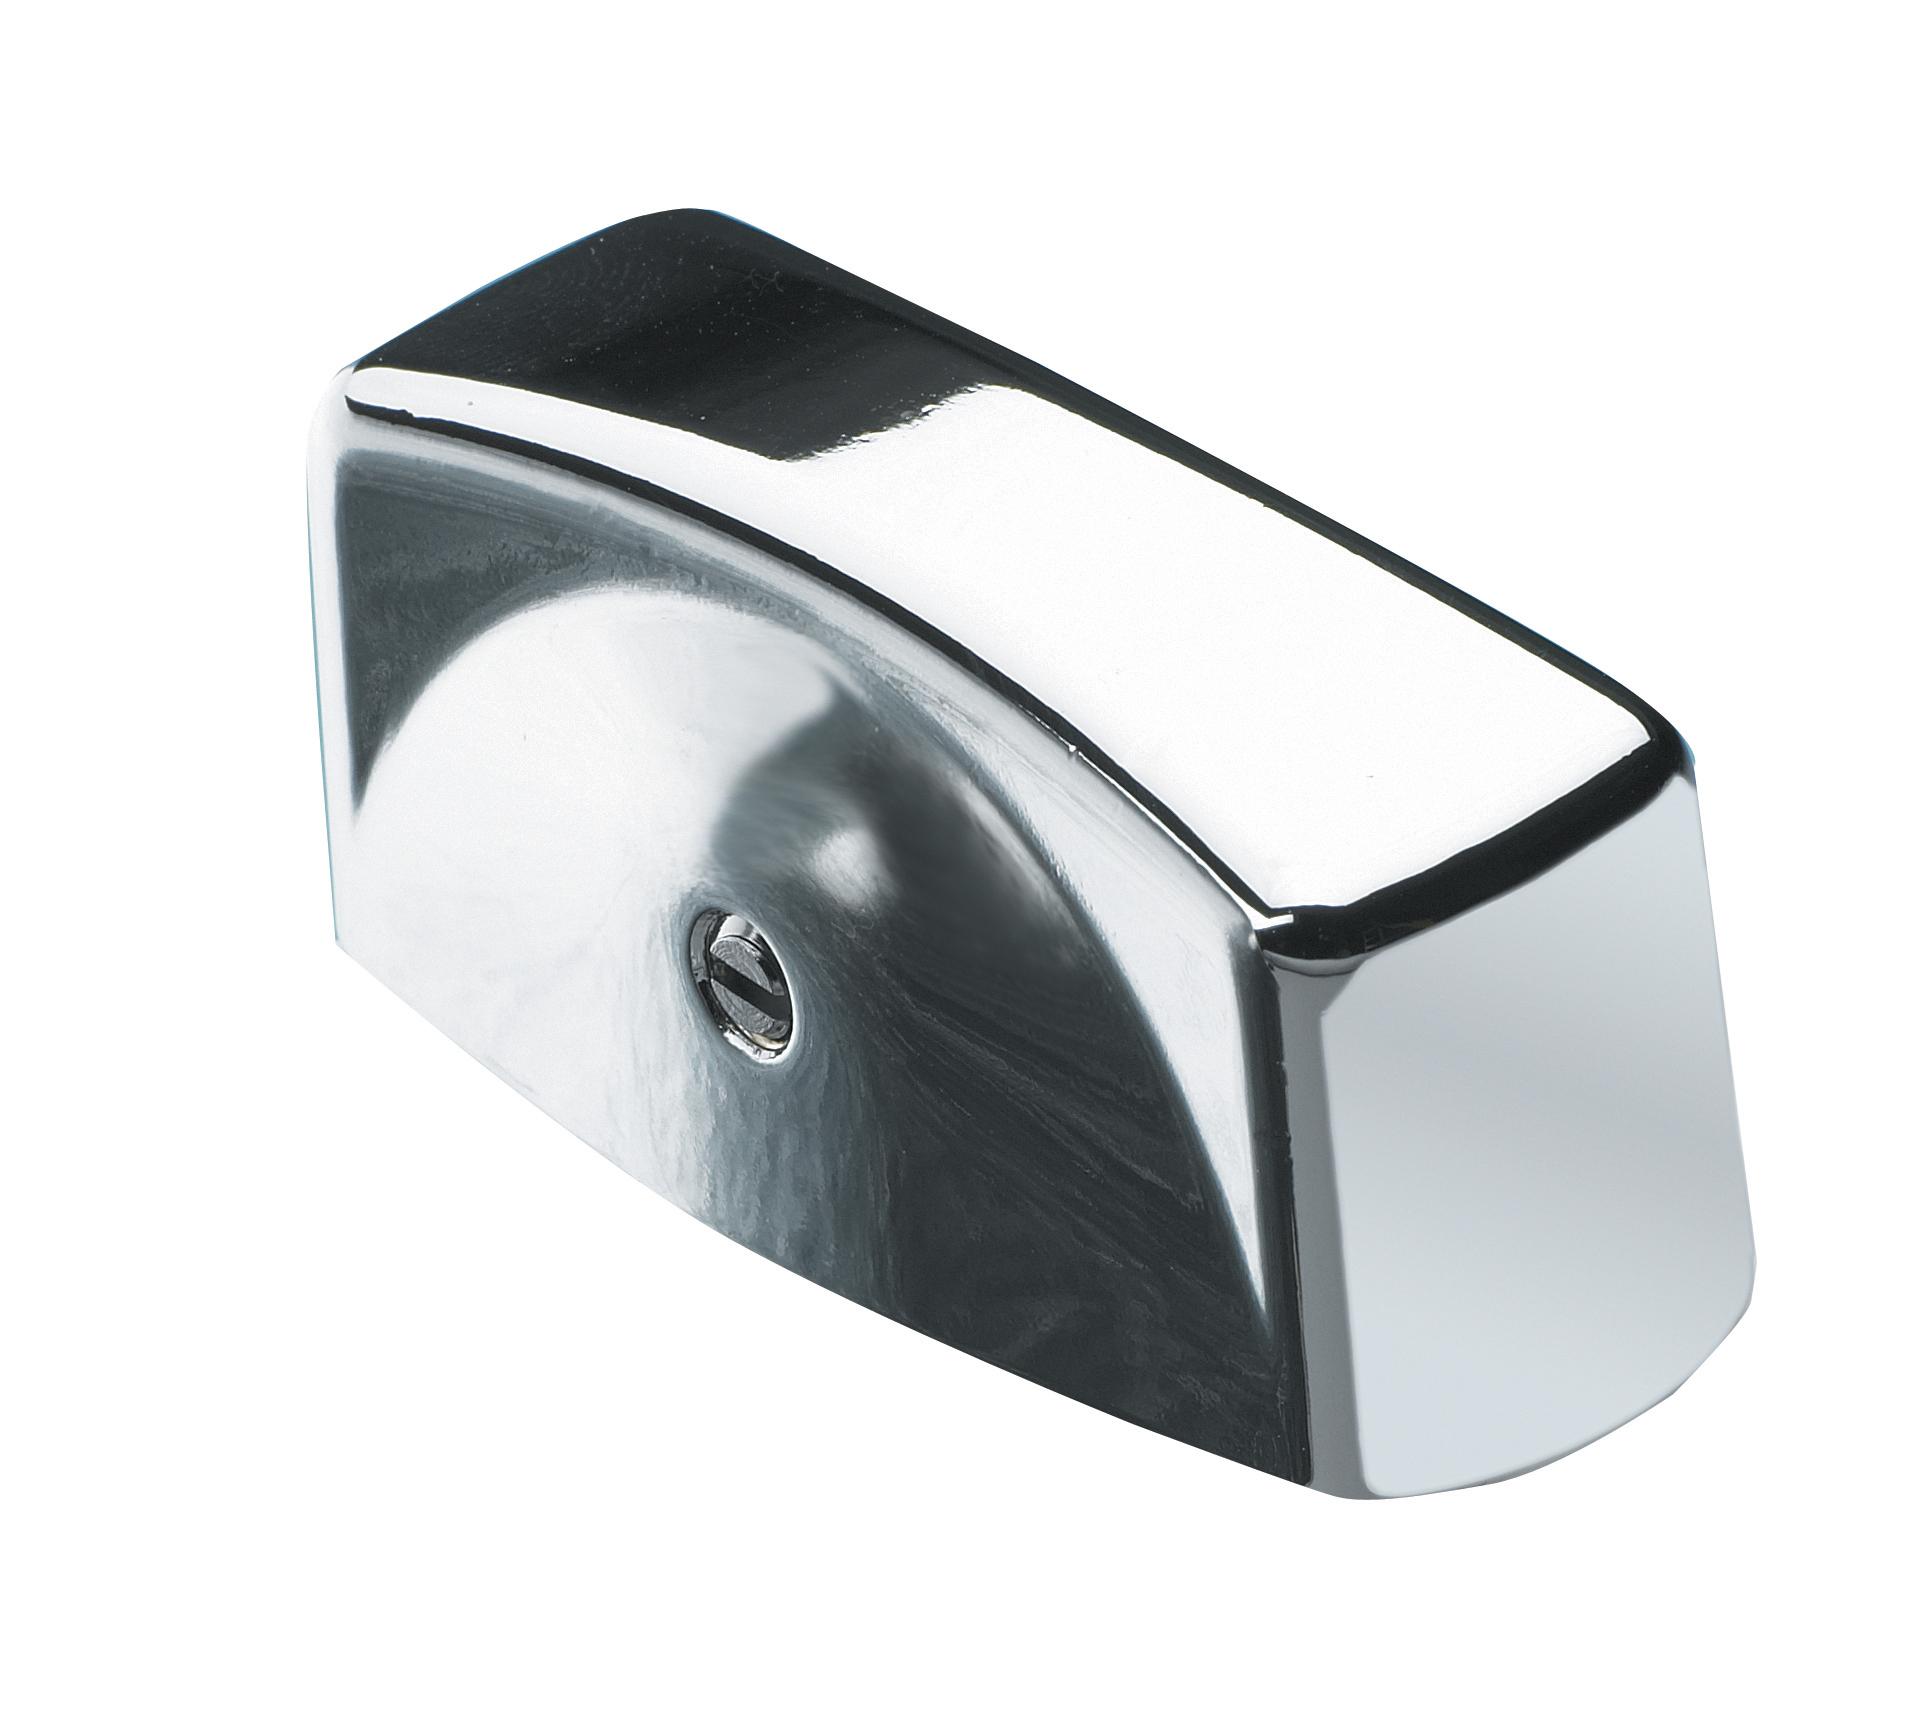 9950-11 Krowne Broiler Knob, Chrome